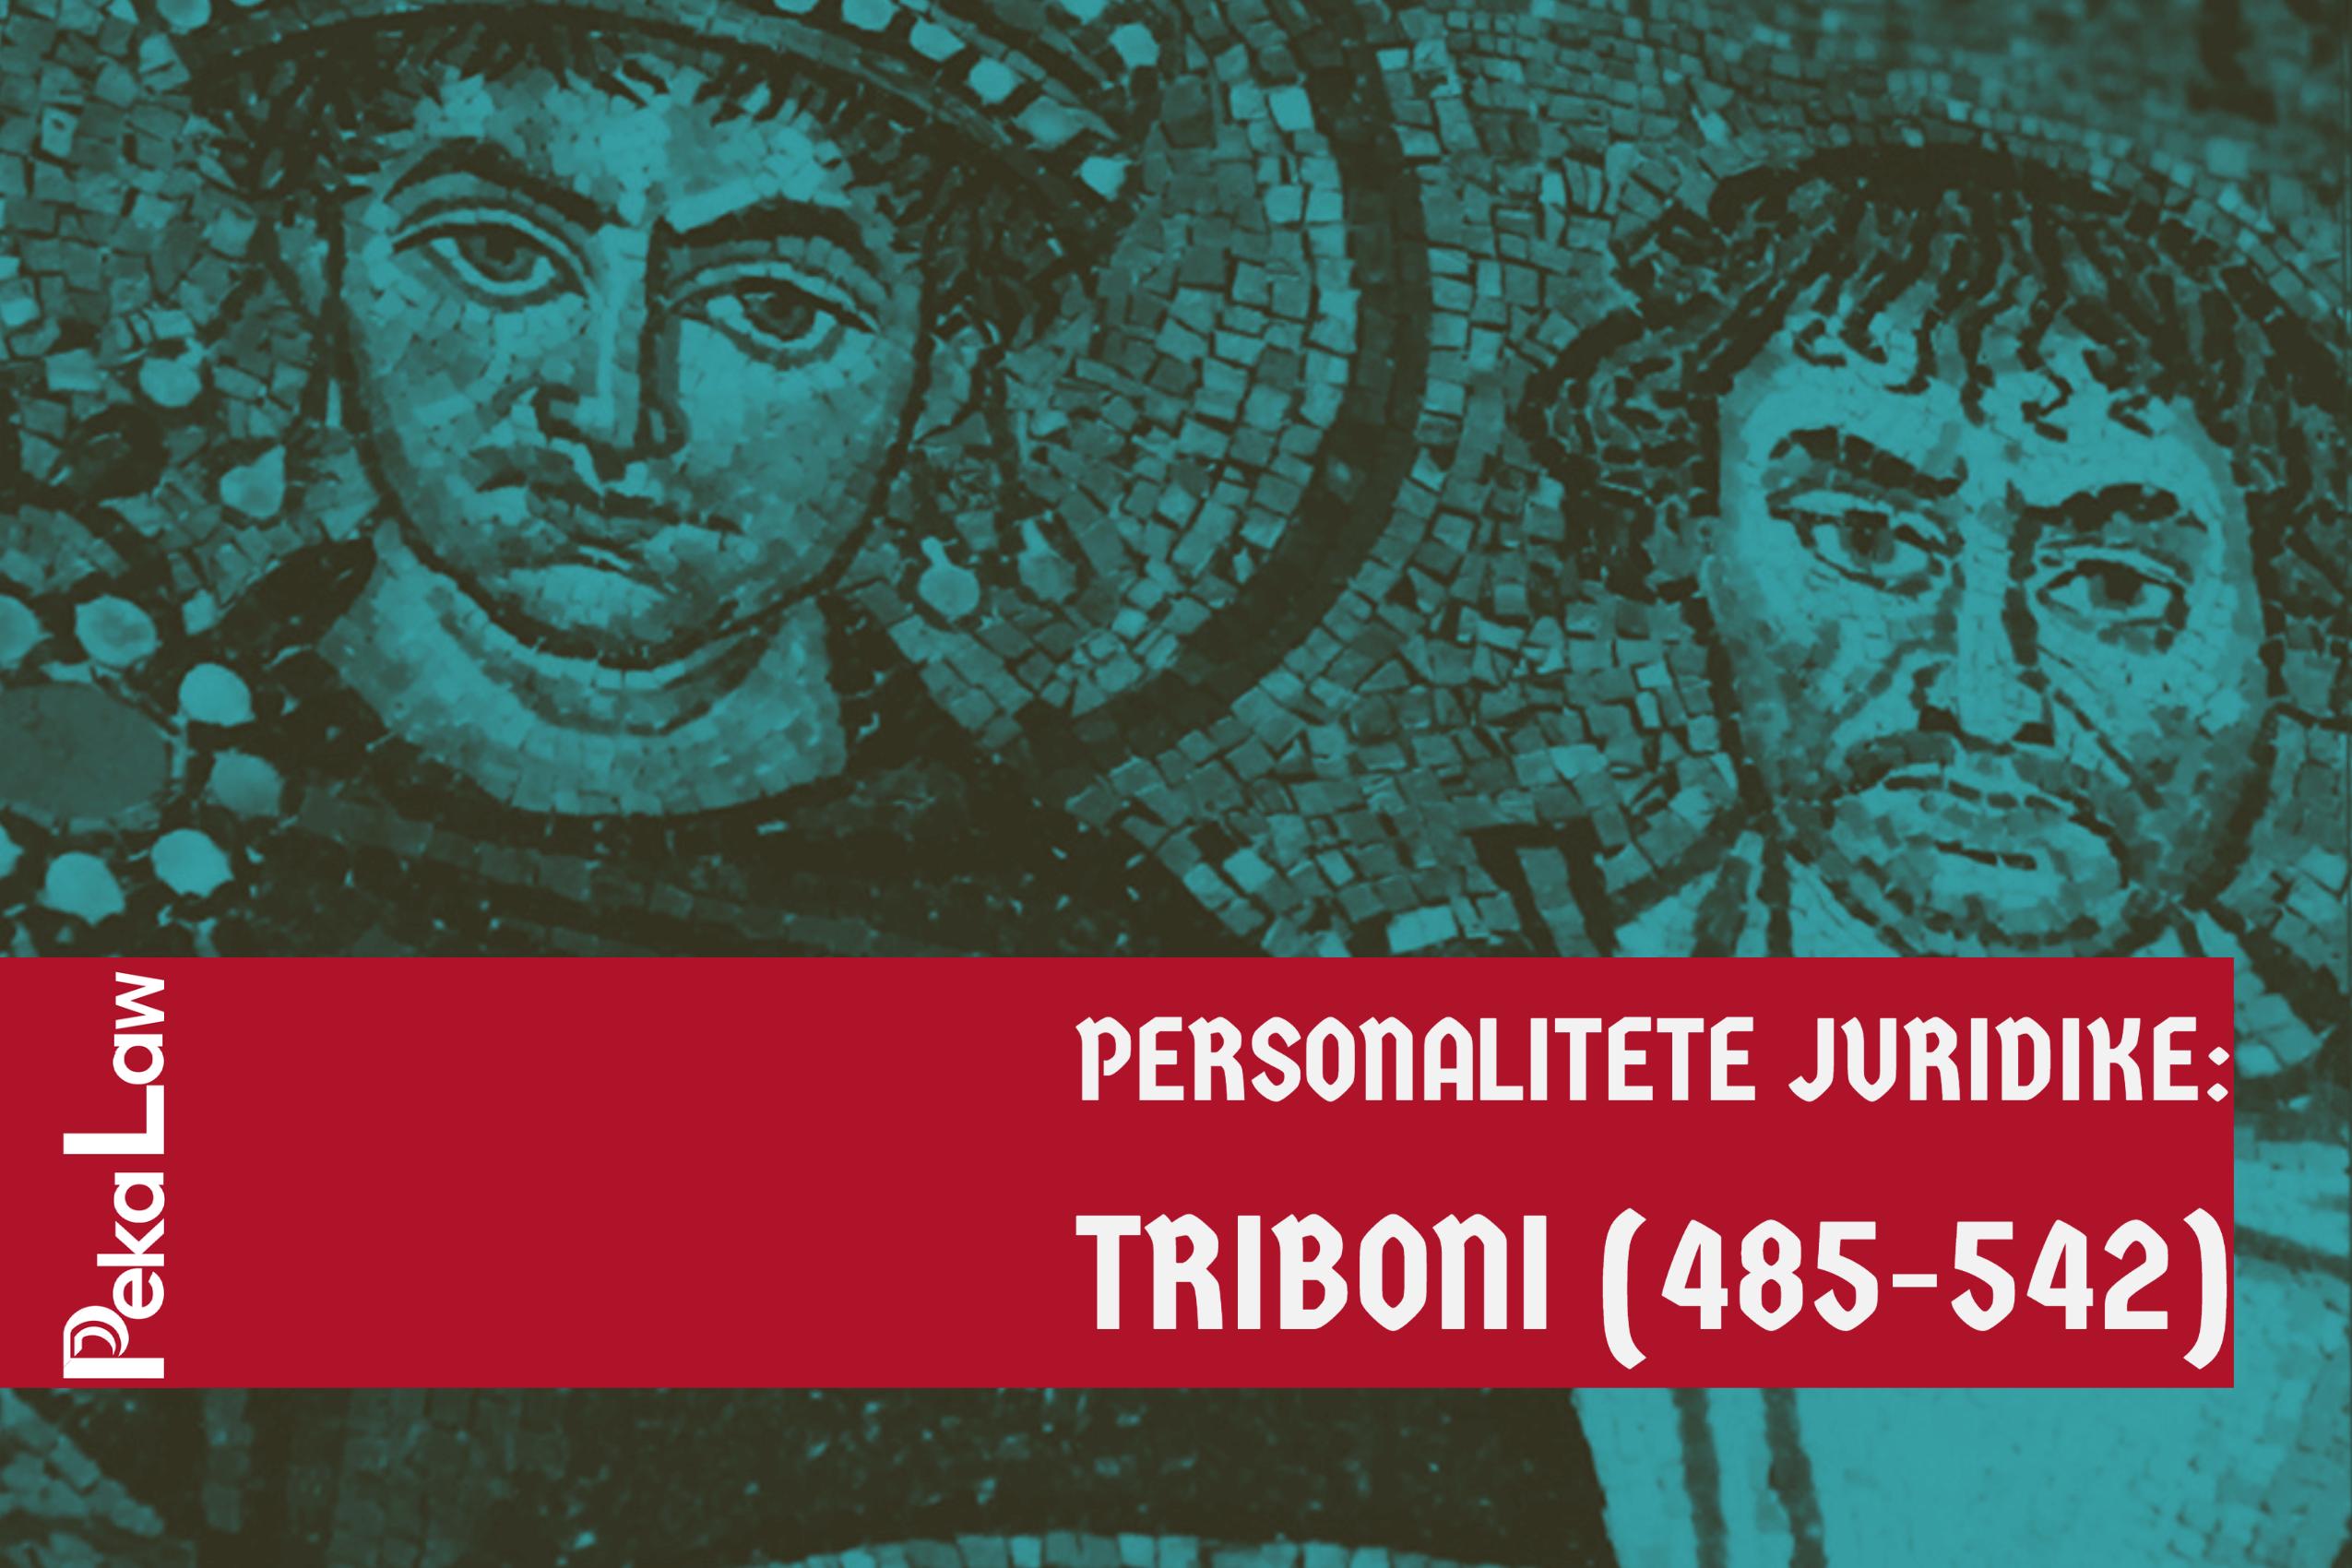 Personalitete Juridike: Triboni (485-542)